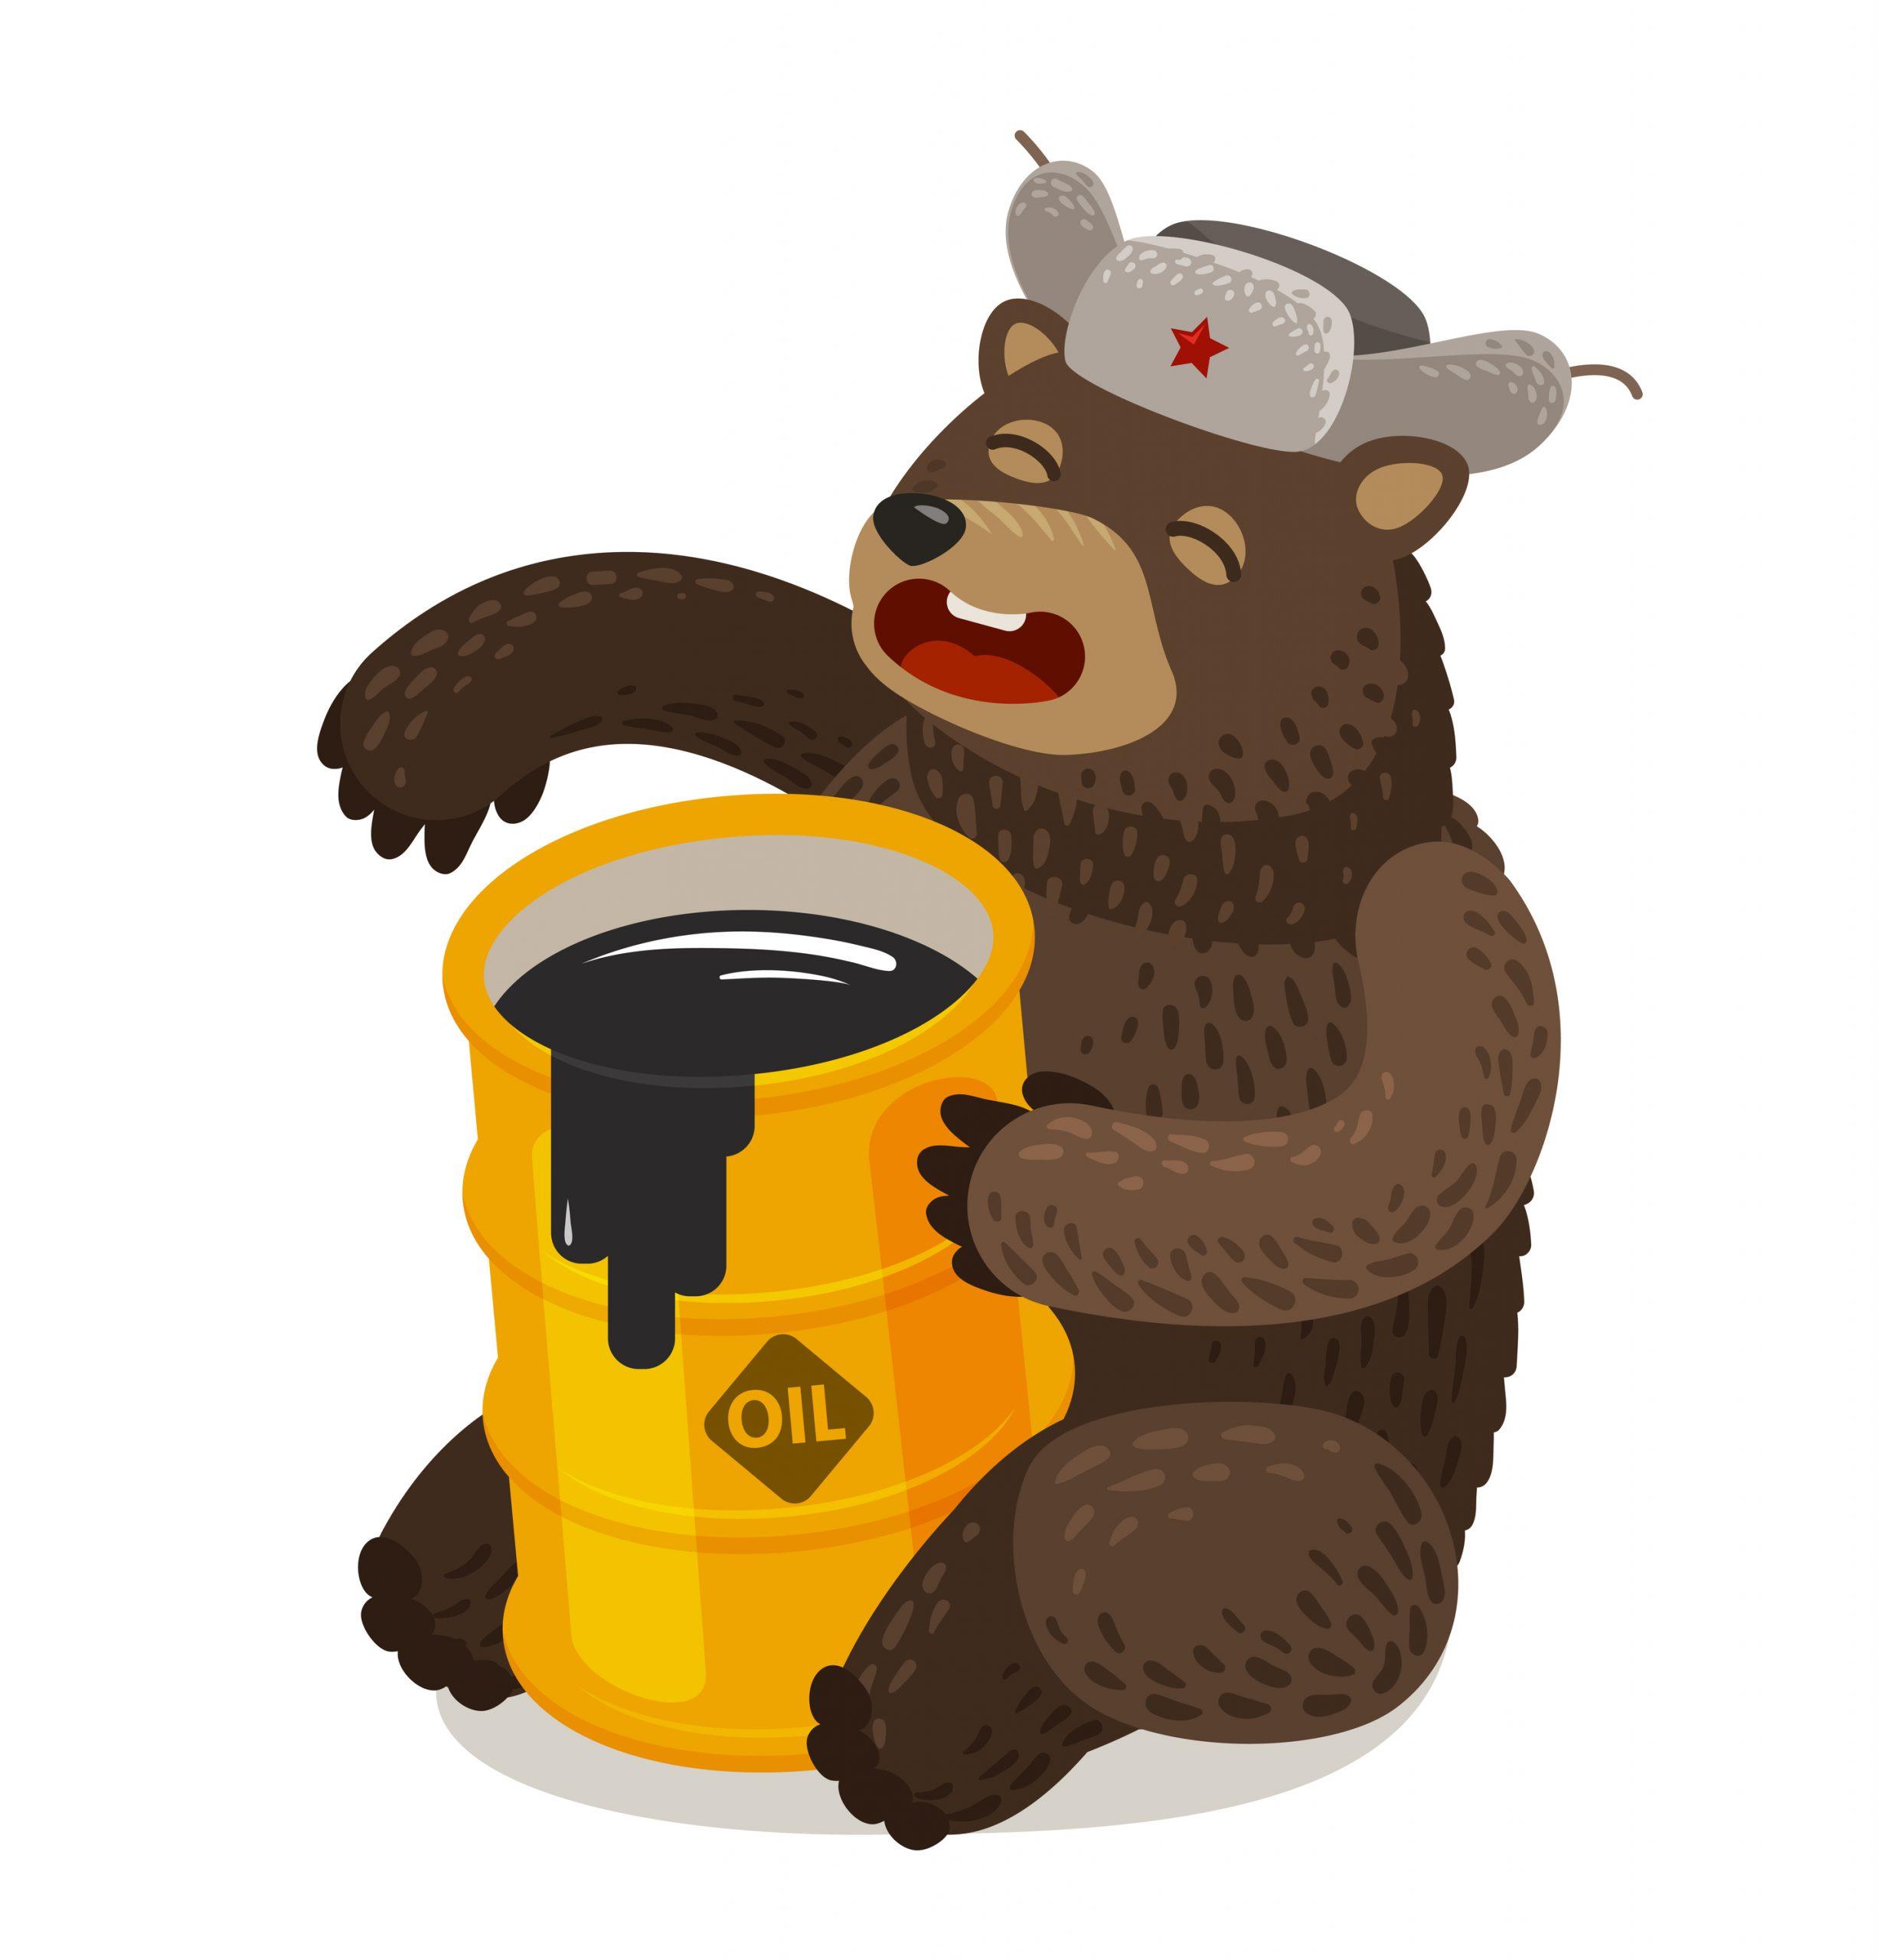 BS_Russian Bear_Oil Barrel_AV Bitter_227849929